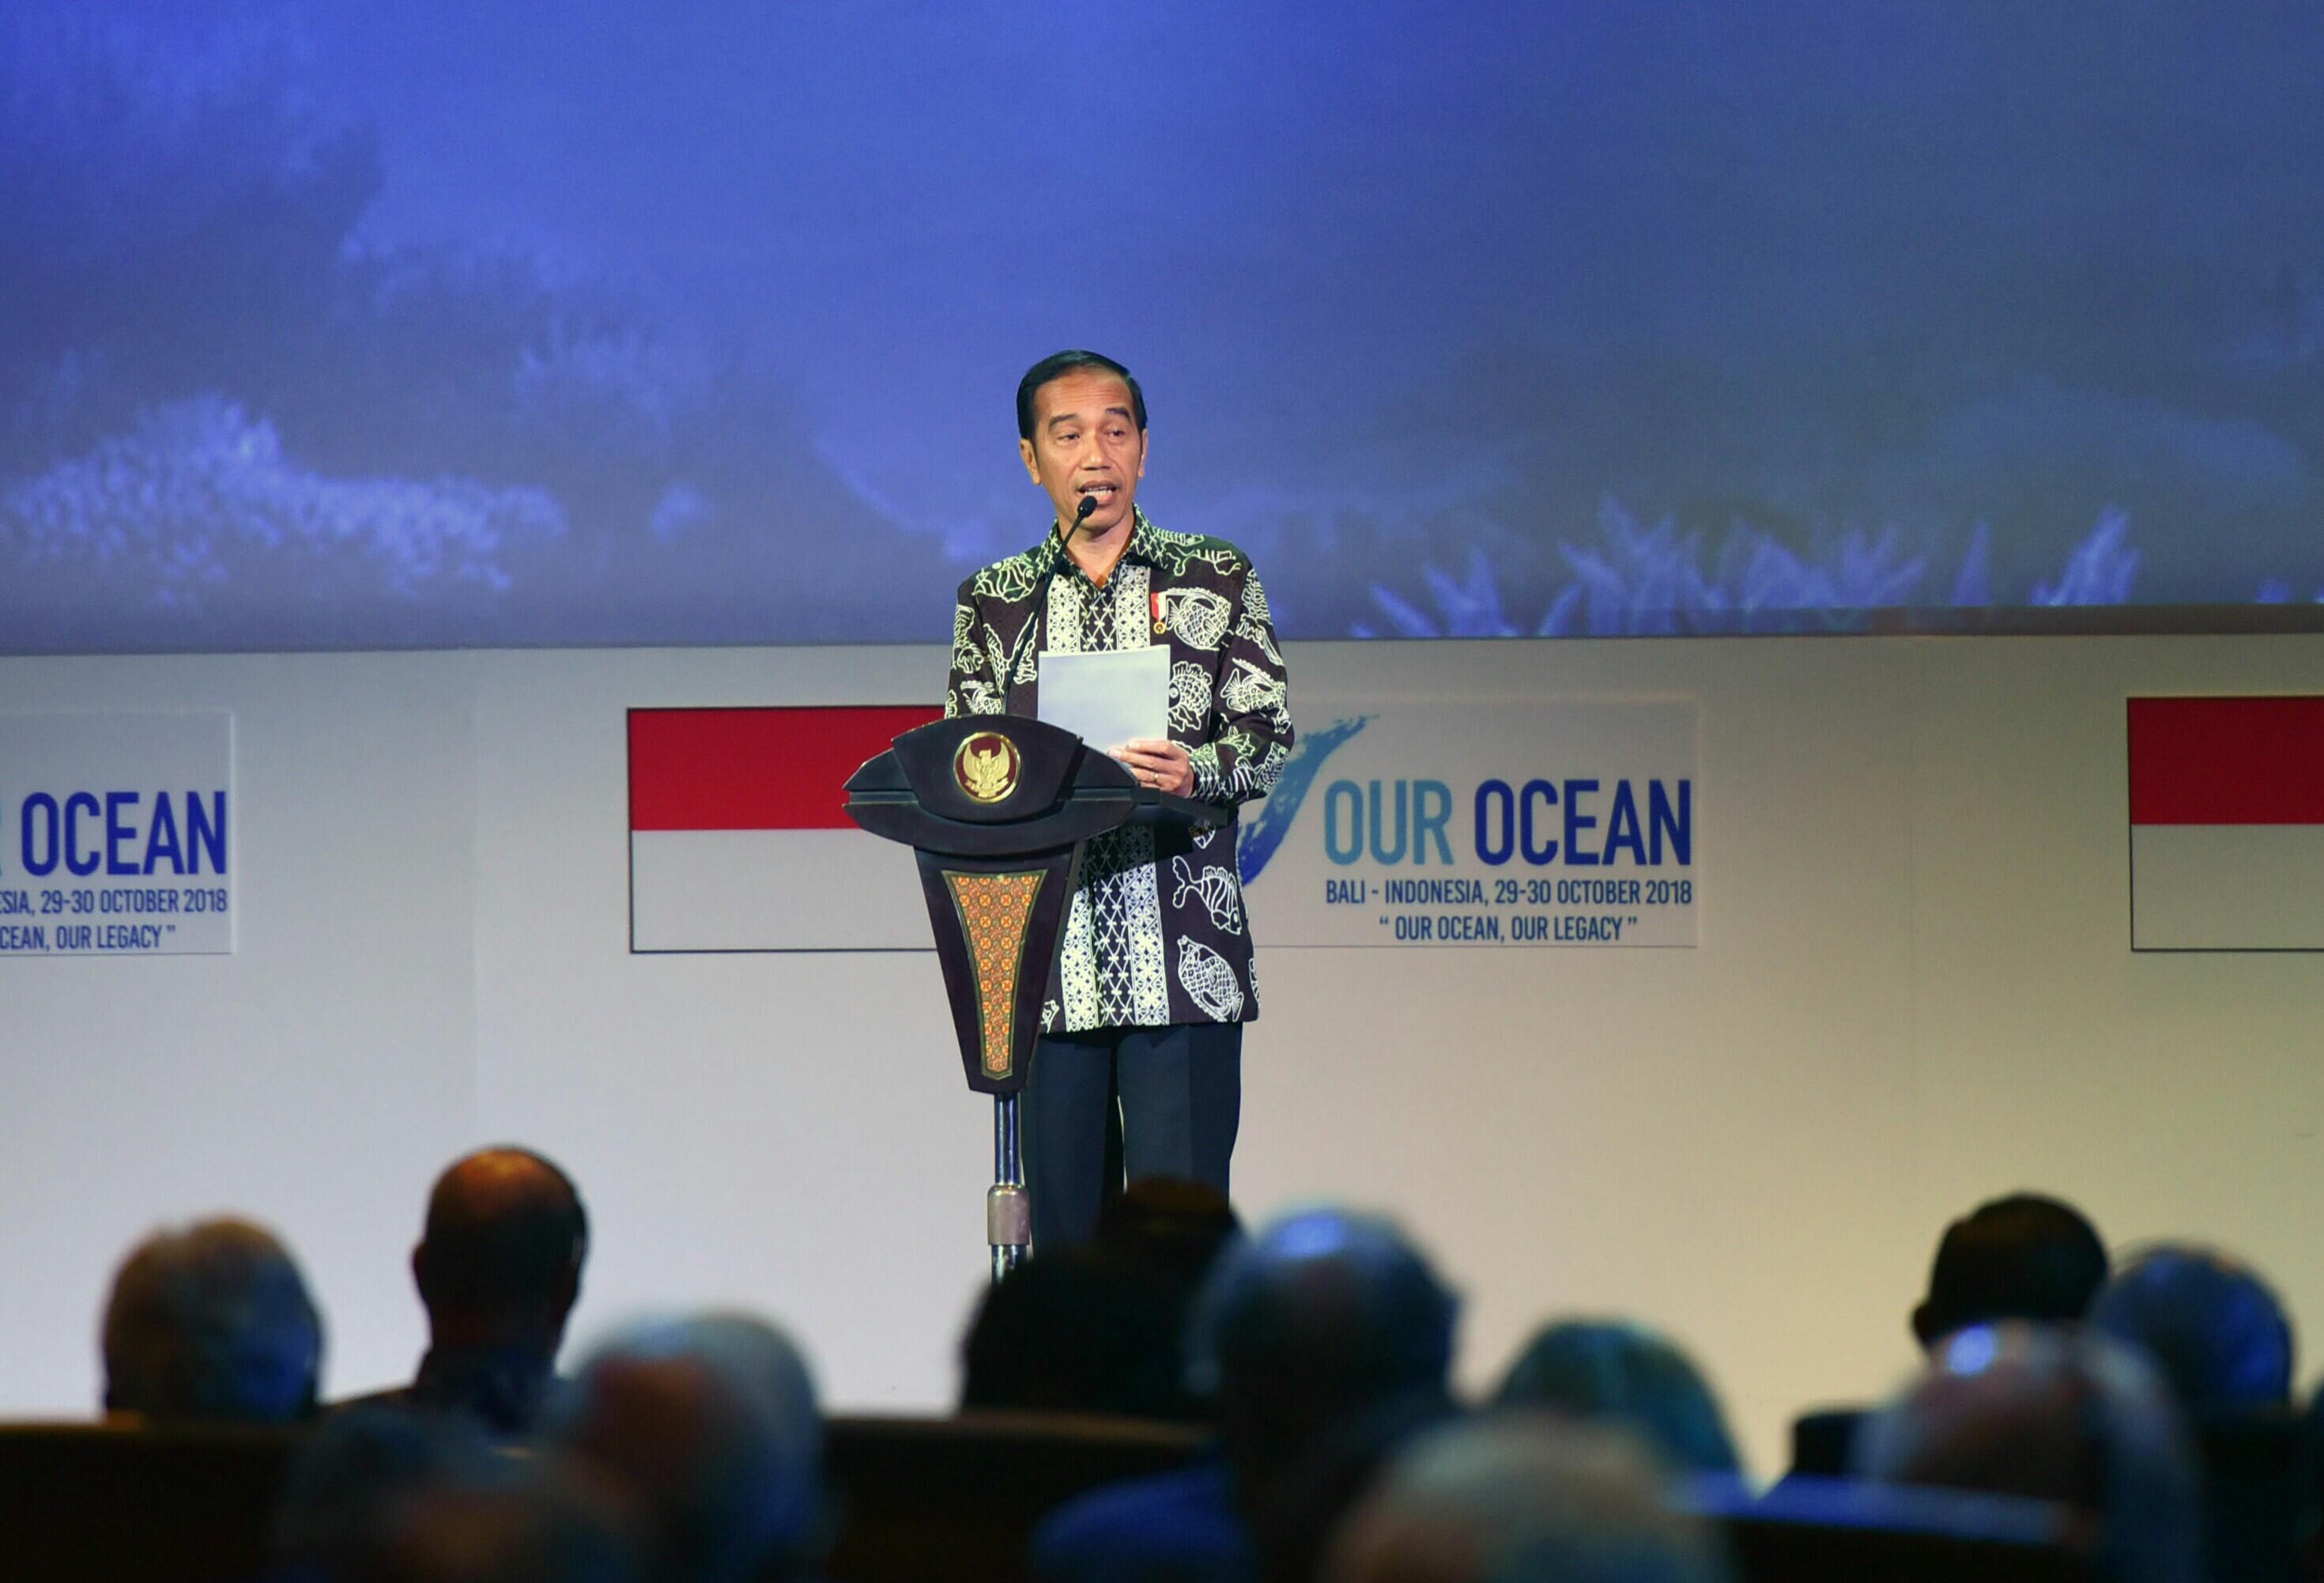 Puisi Presiden di Pembukaan OOC 2018: Lautmu Adalah Masa Depanmu